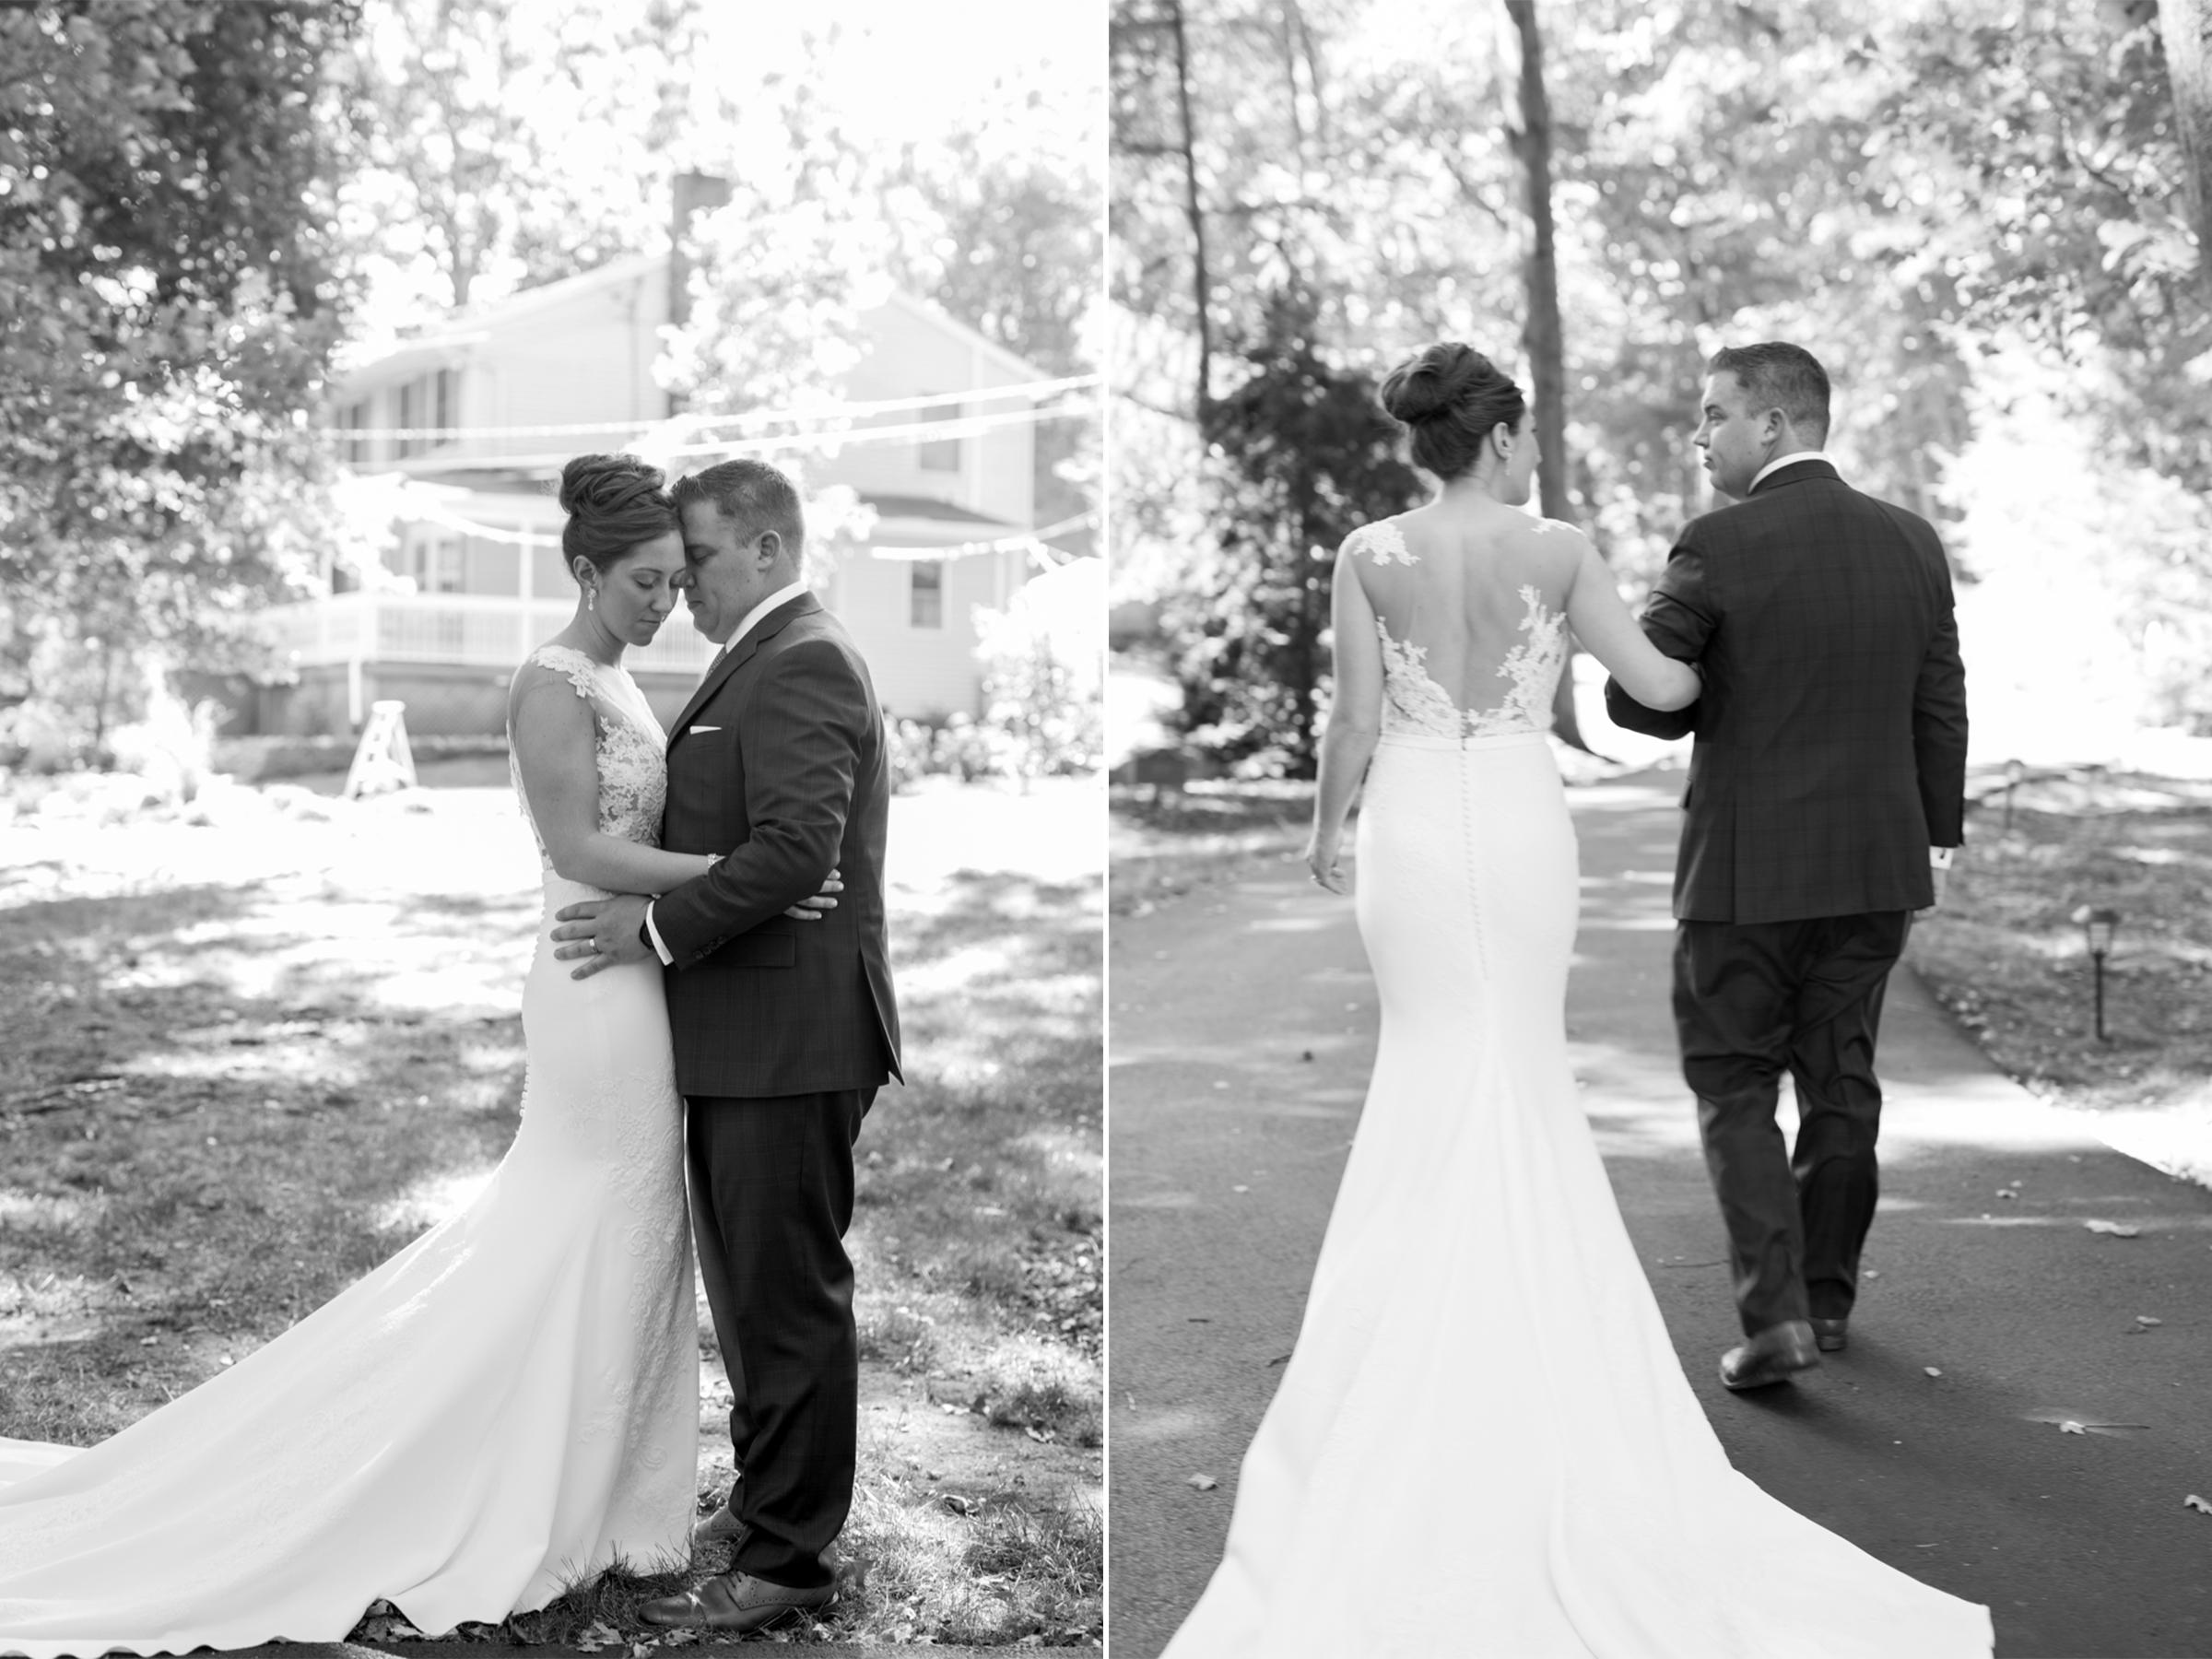 Lauren+AJ- Bride and Groom Portraits Black and White- DIY Backyard Wedding- New Jersey- Olivia Christina Photo.jpg